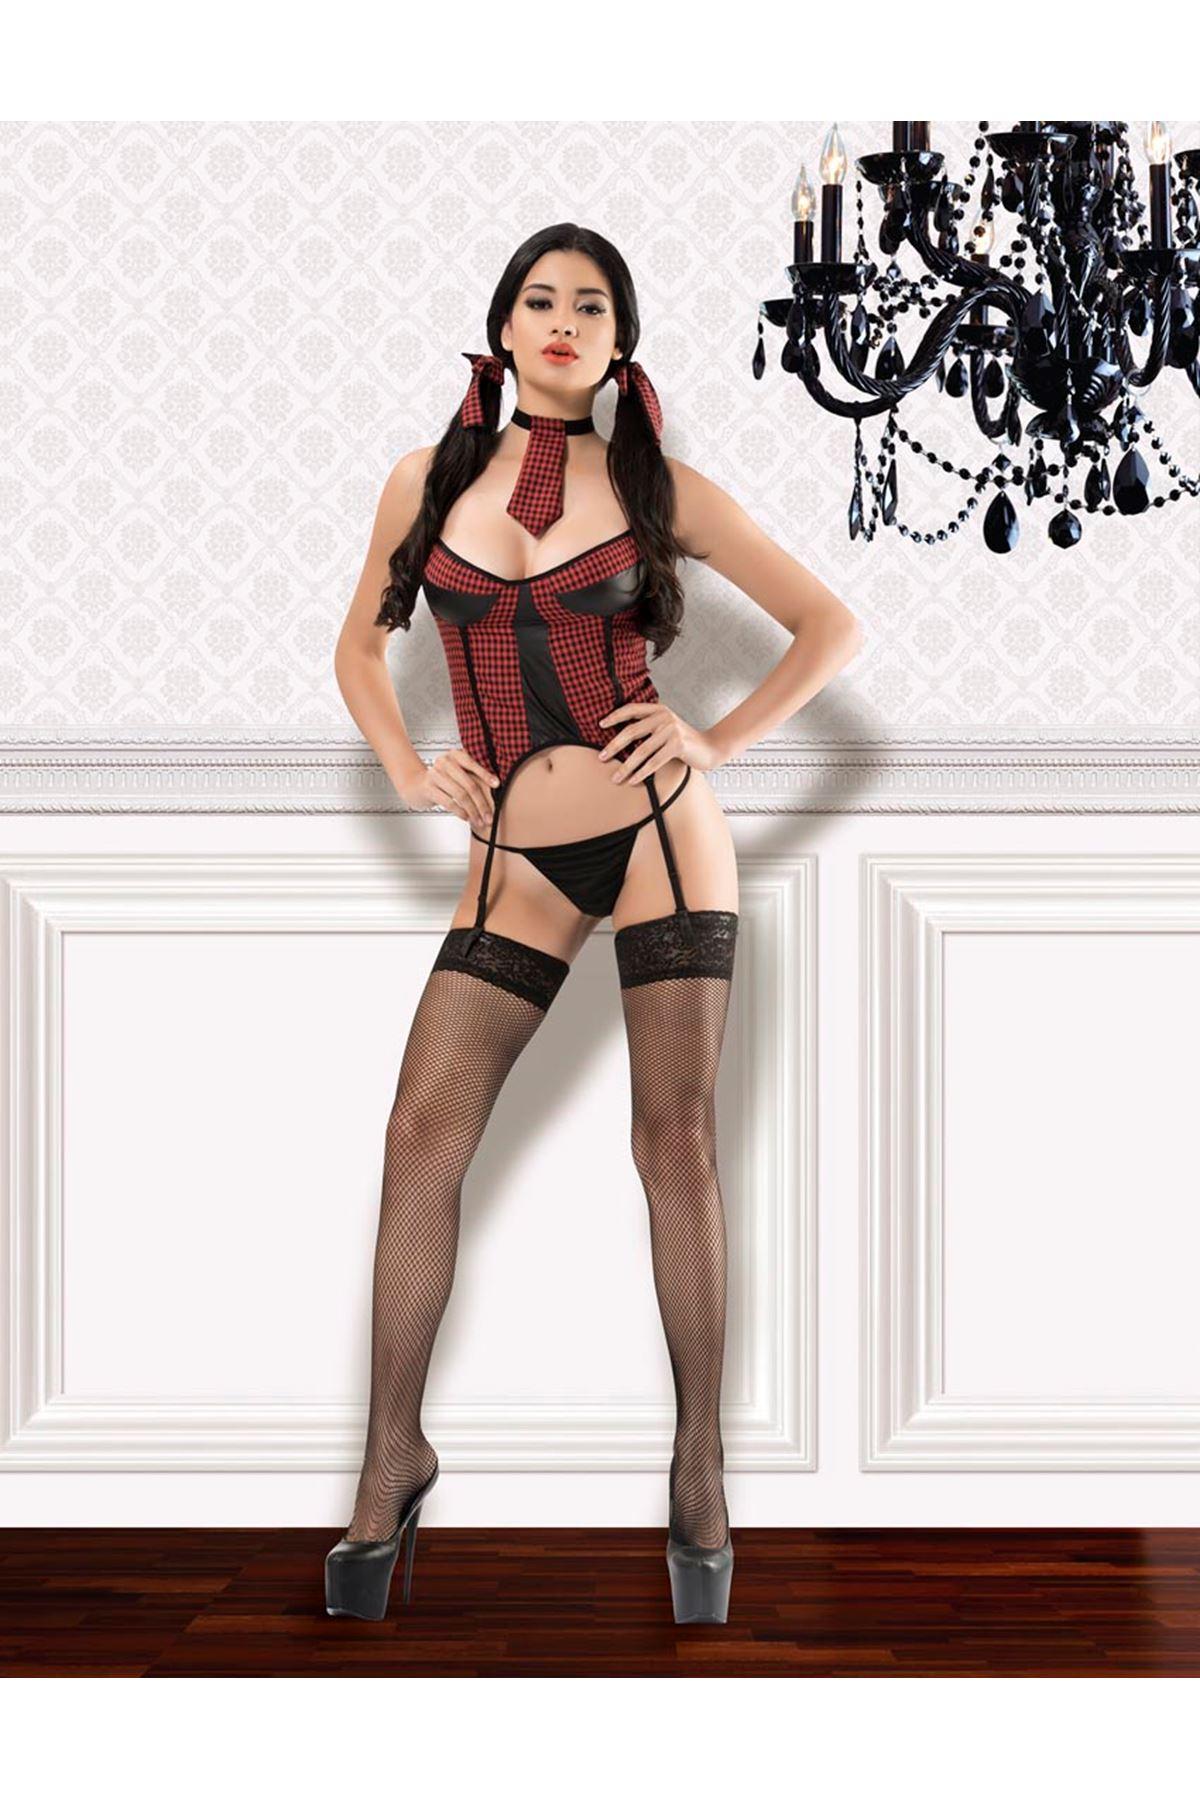 Vip Madame Kadın Fantezi Lolita Kostüm